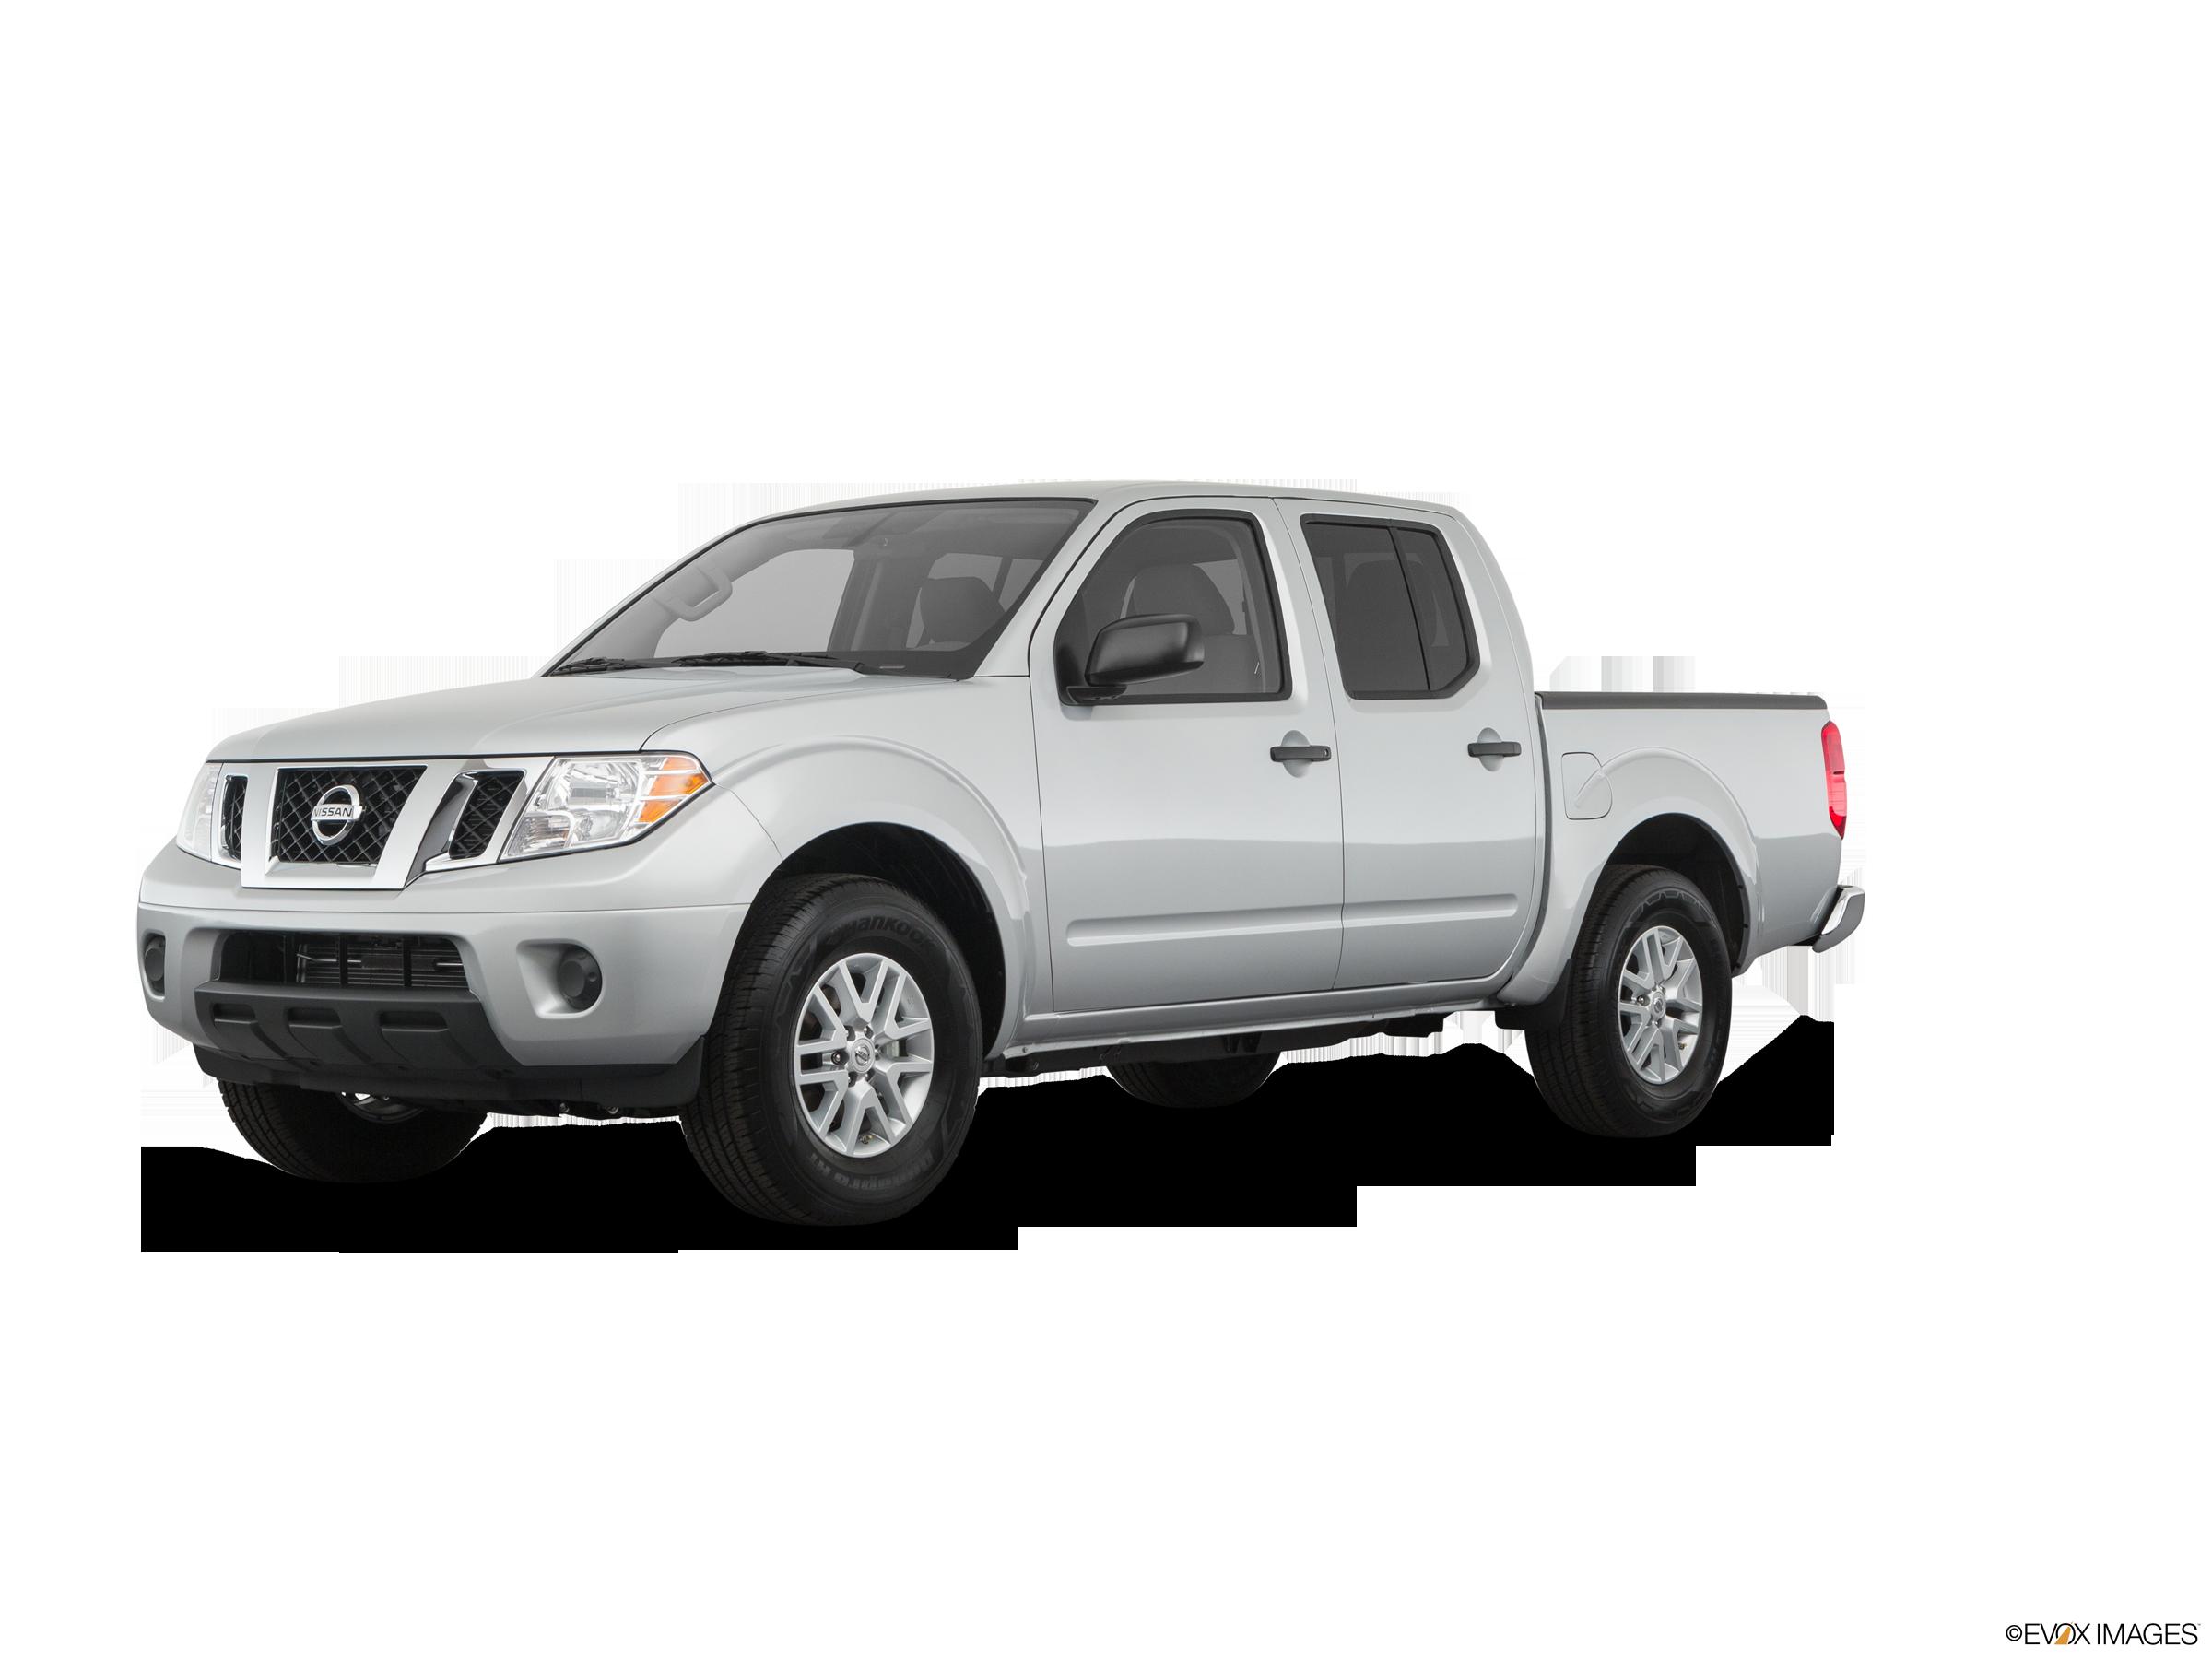 Nissan Frontier Crew Cab >> 2019 Nissan Frontier Crew Cab Pricing Ratings Expert Review